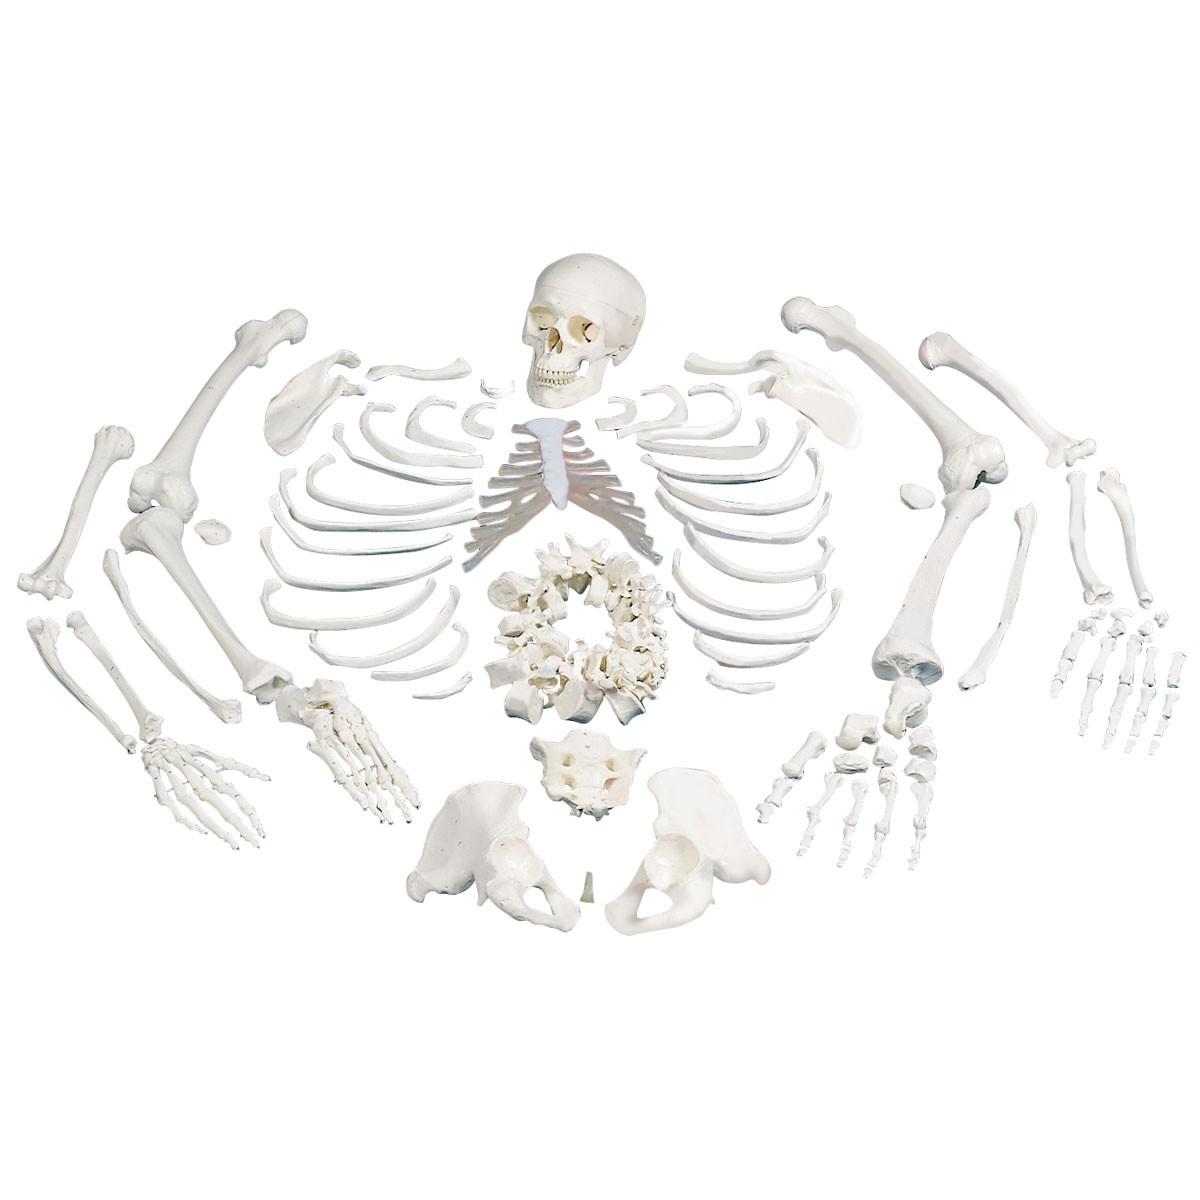 3b Disarticulated Skeleton